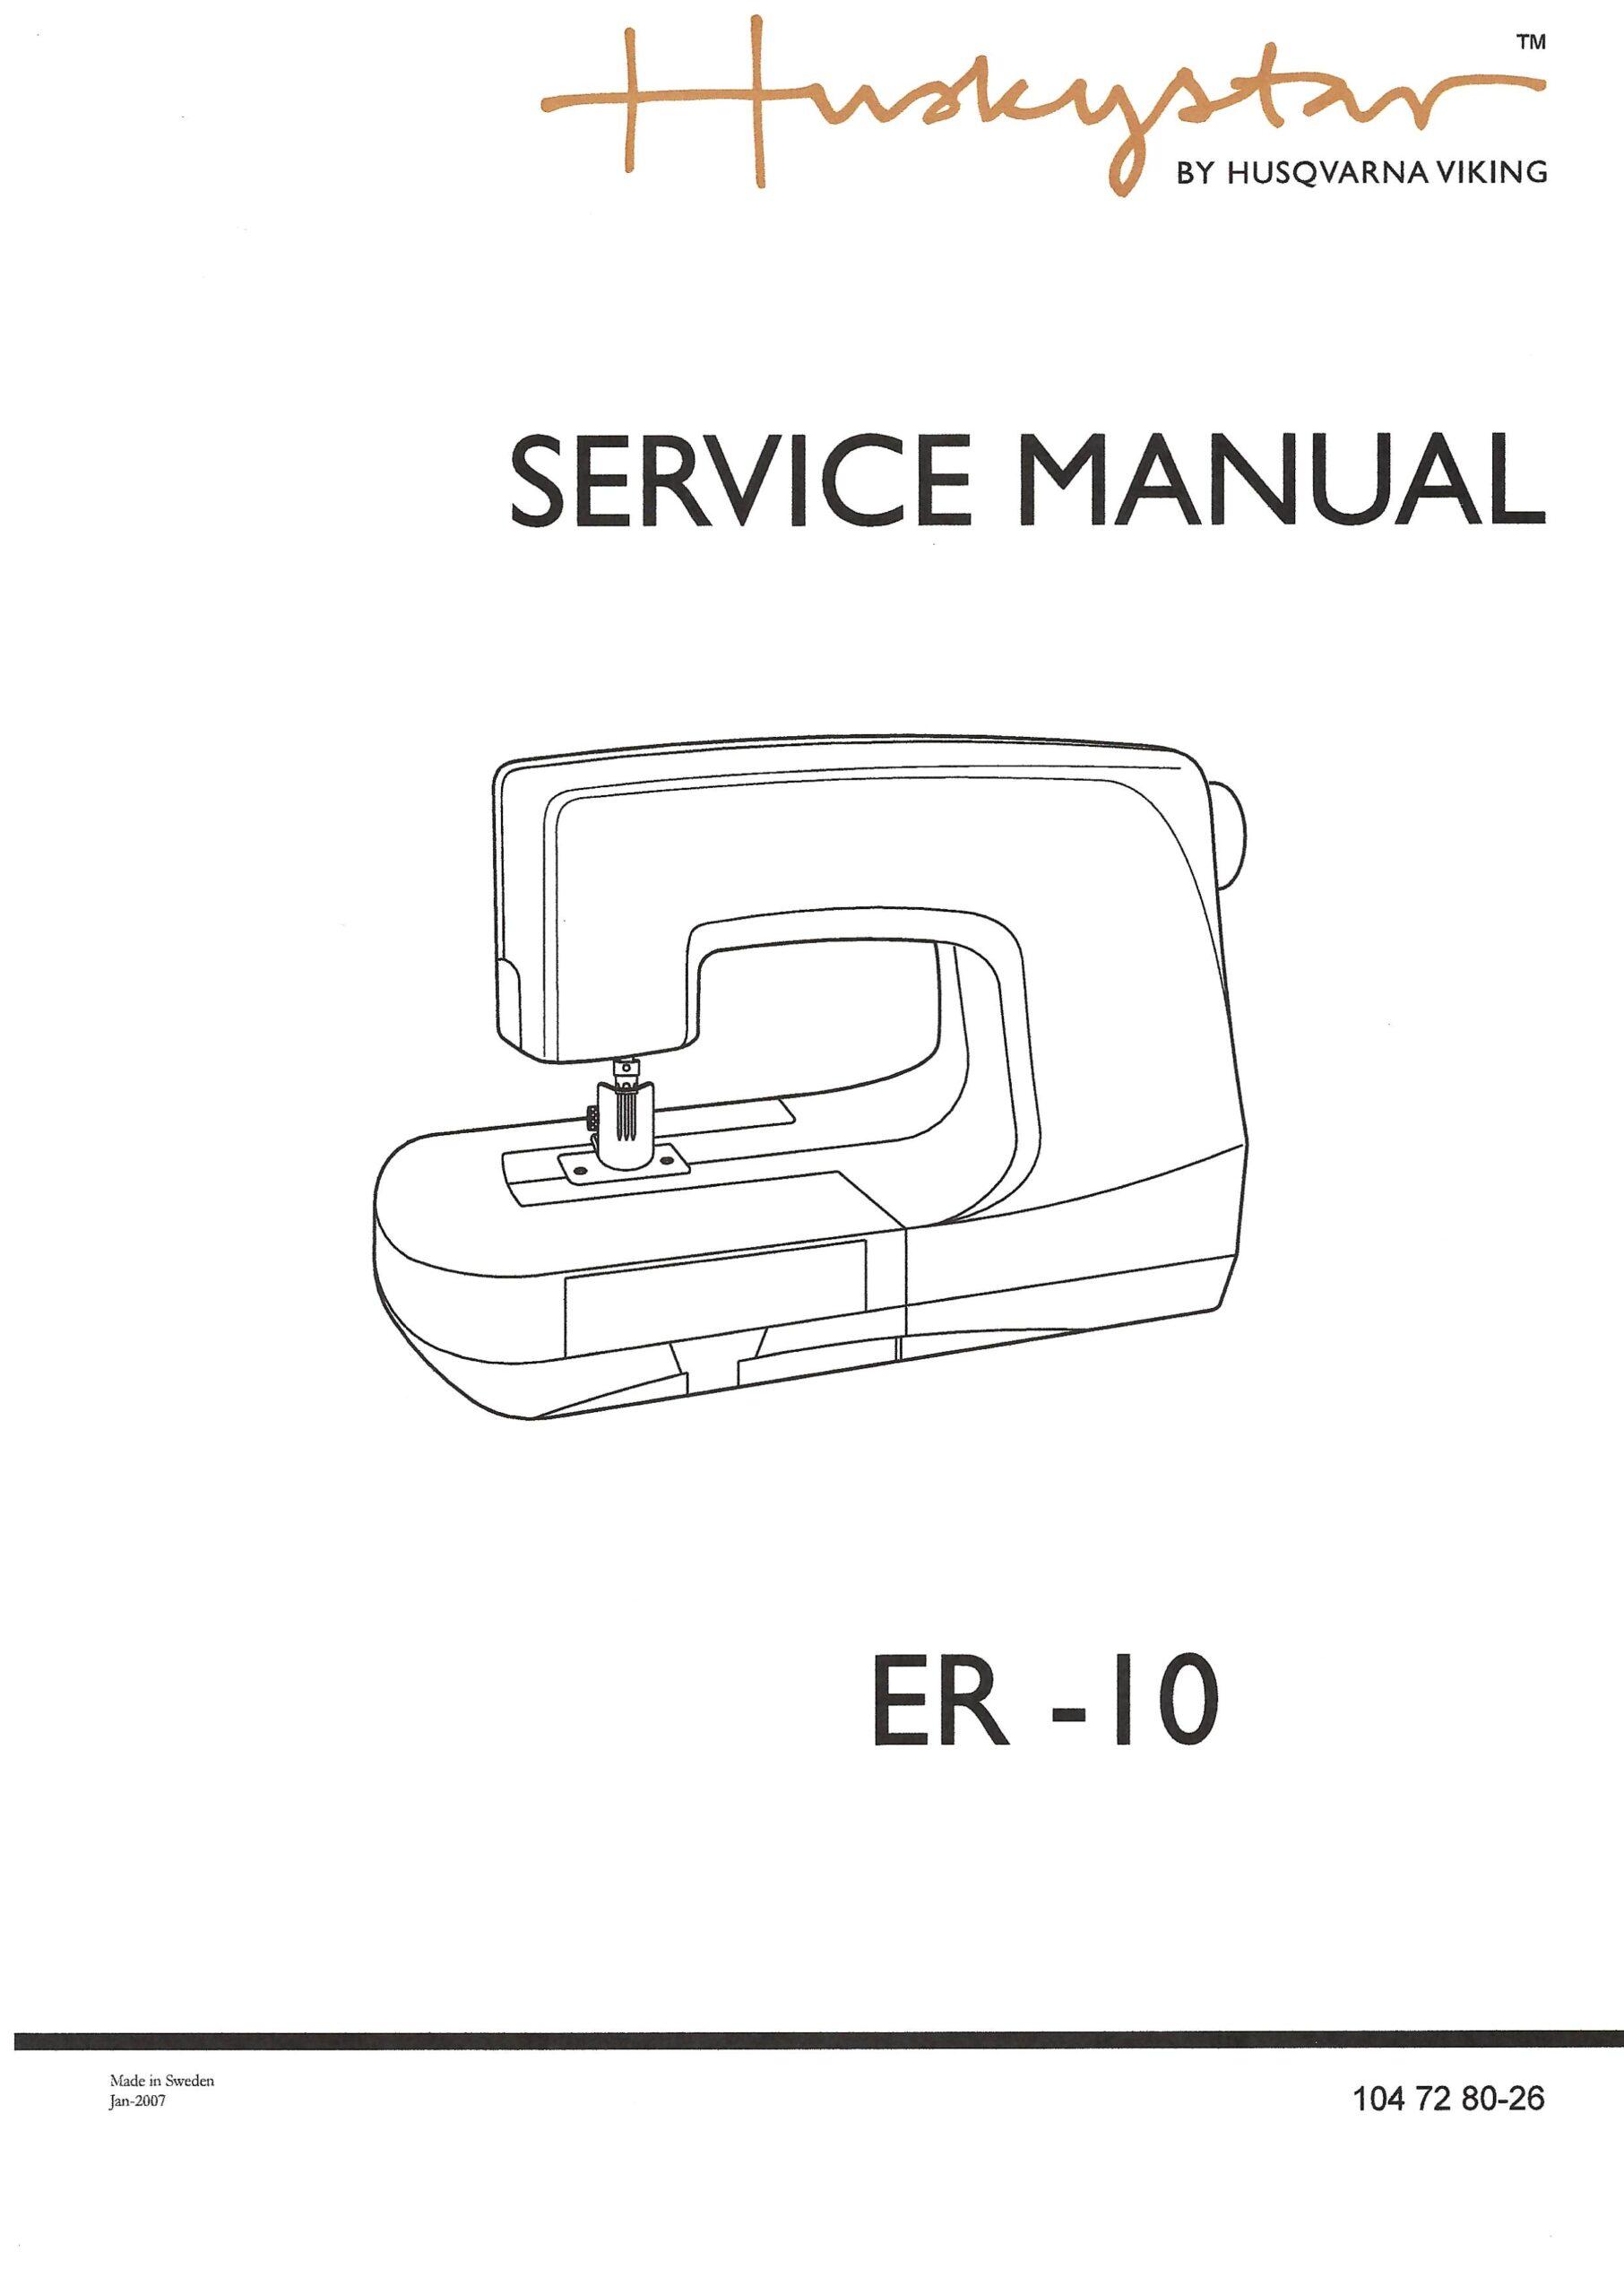 Service Manual Viking Huskystar ER-10, H-Class Sewing Machine